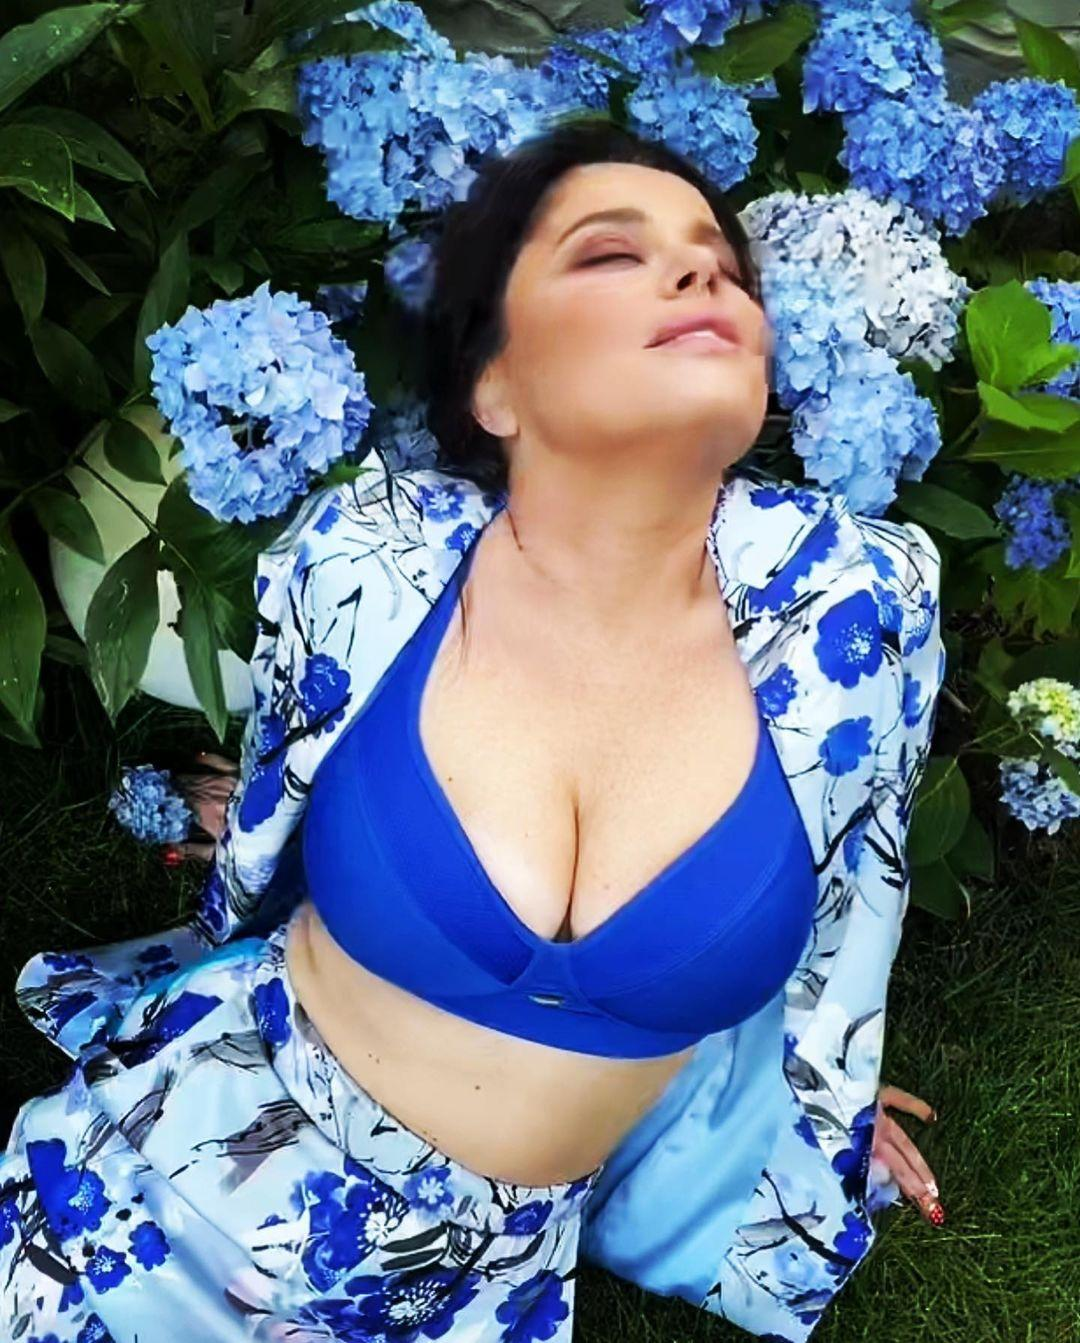 Наташа Королева / фото instagram.com/koroleva__star